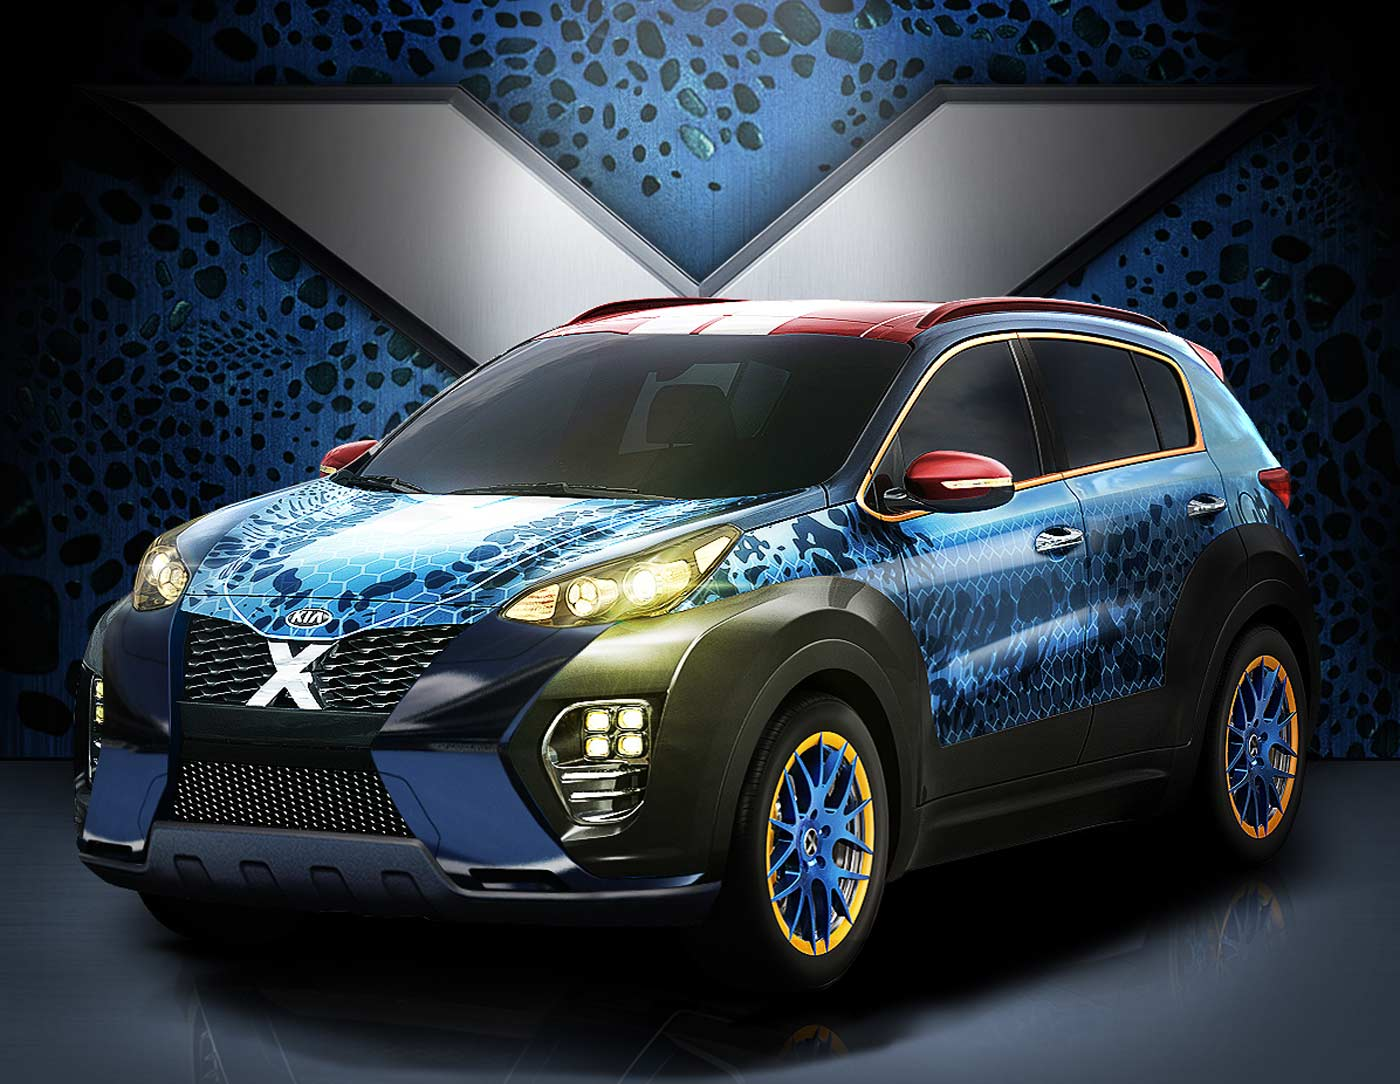 El Nuevo Kia X Car Antecesor De La Pr 243 Xima Pel 237 Cula X